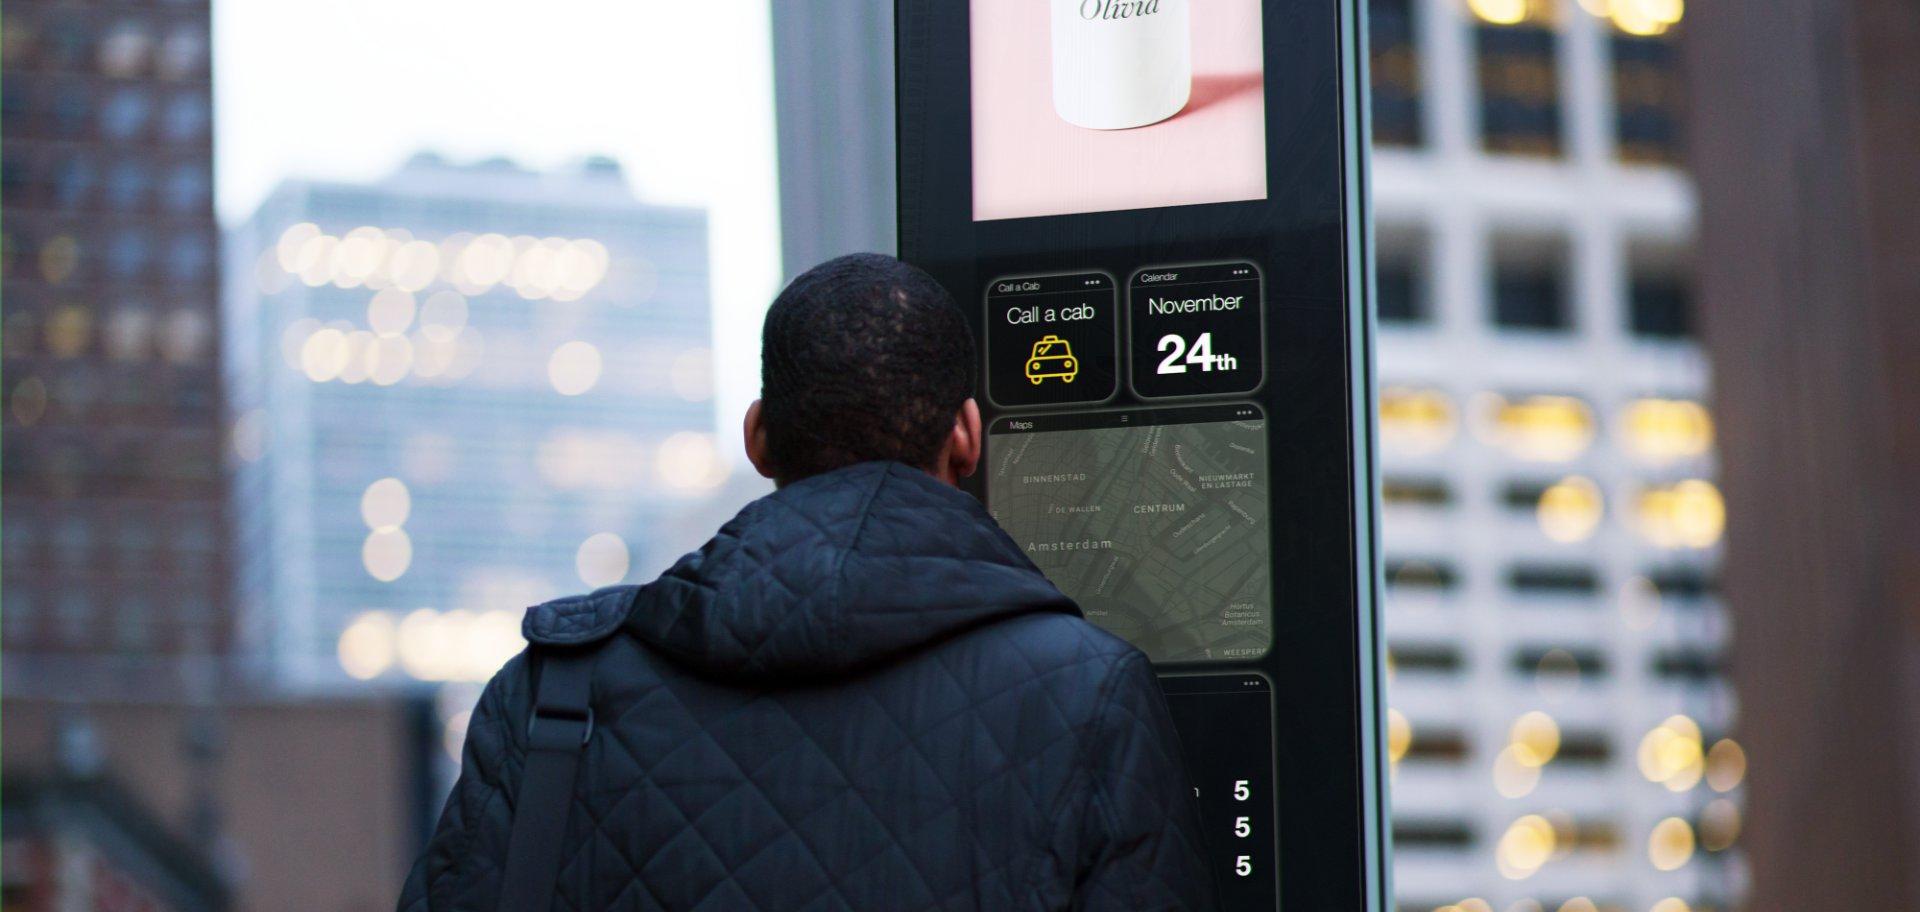 maestro-urban-kiosk-city